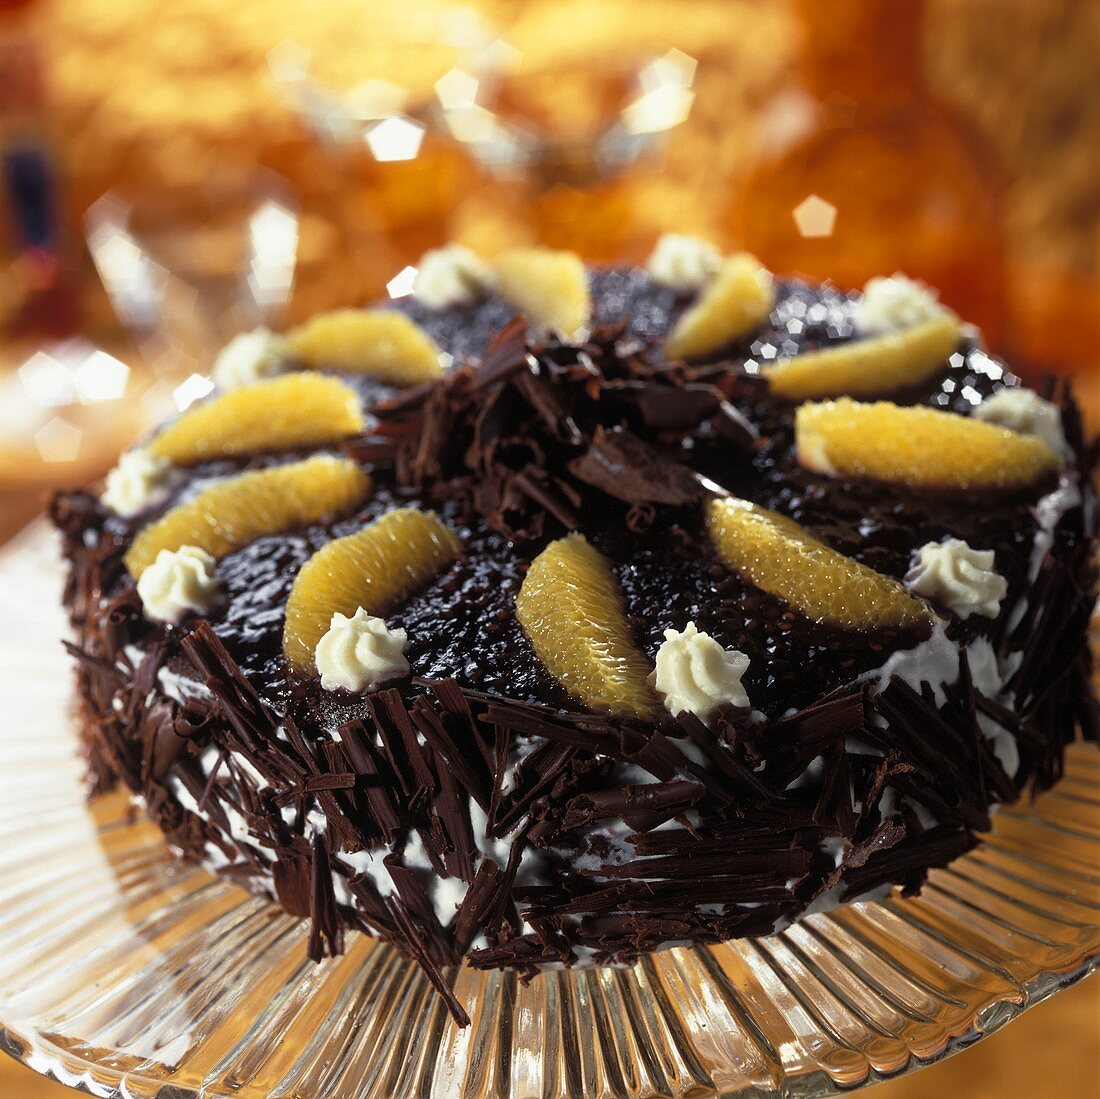 Chocolate cream gateau with blackberry icing & orange segments